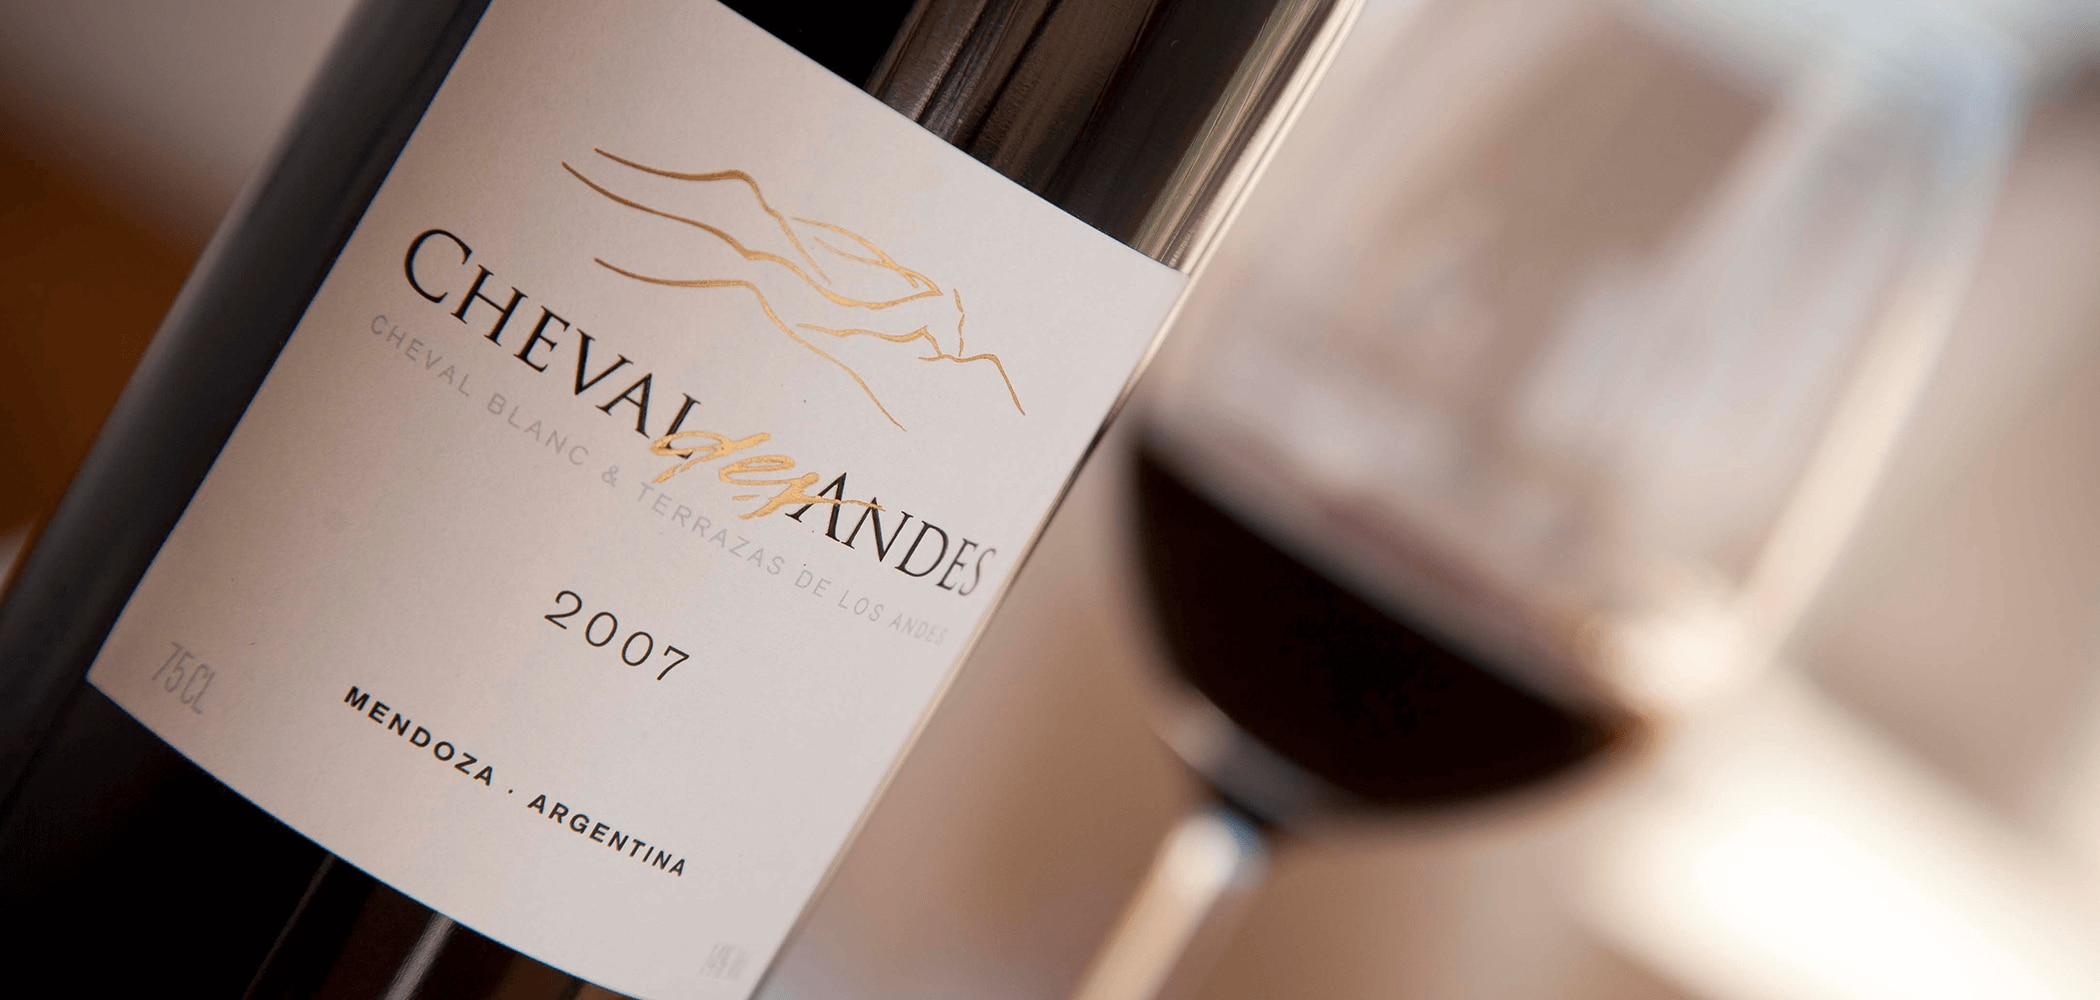 2007 Cheval Des Andes